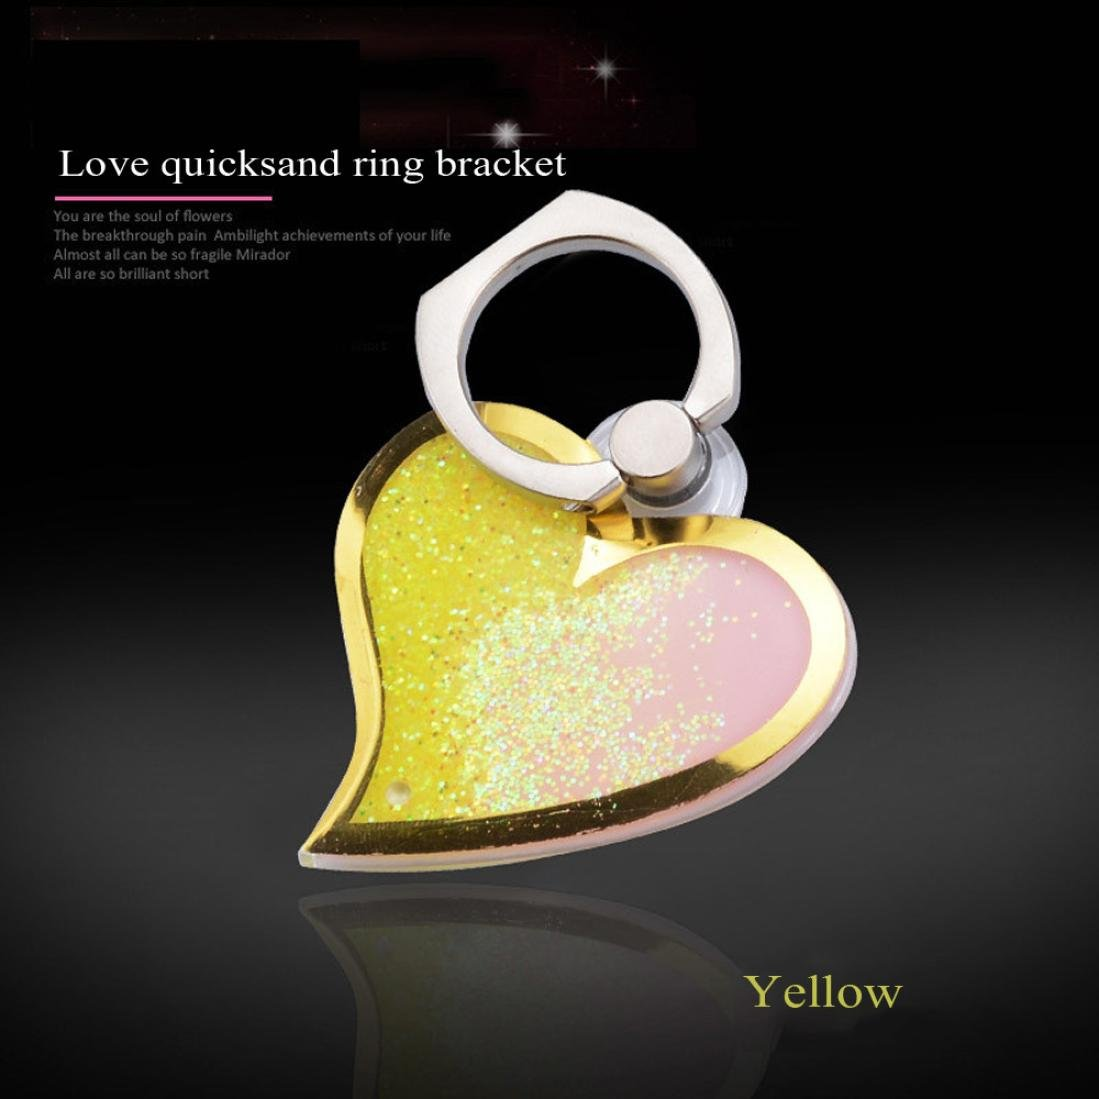 Finger Ring Stand, SUKEQ 360° Rotation Love Shape Mobile Phone Holder, Metal Heart Bling Ring Mirror Stand Holder, Phone Ring Bracket, Mount Holder (Yellow) by SUKEQ (Image #2)